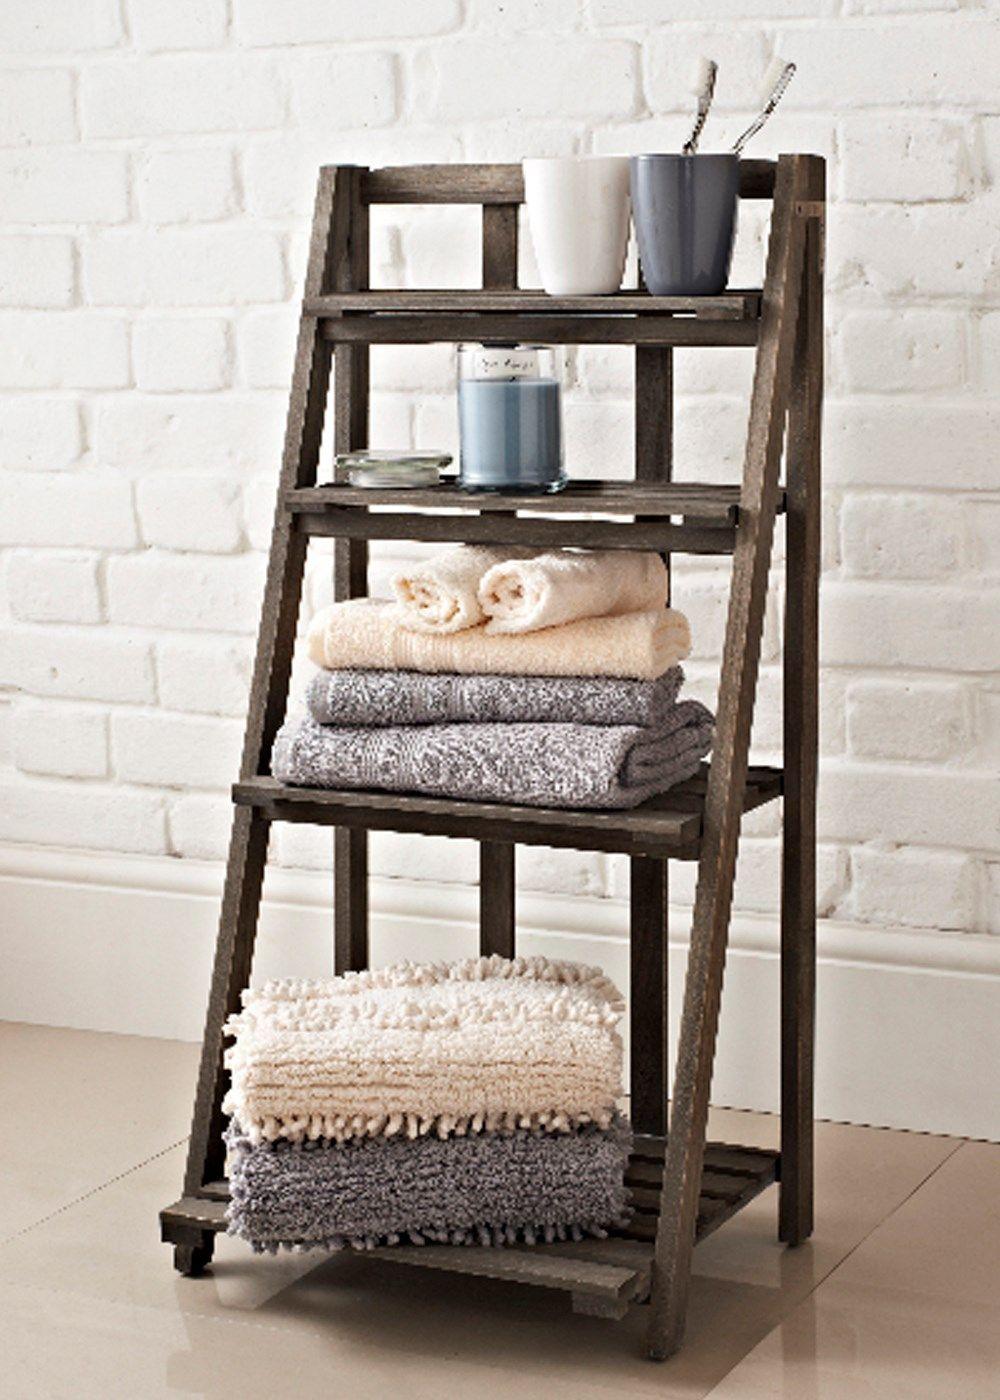 slatted bathroom shelving ladder unit 40cm x 30cm x 80cm